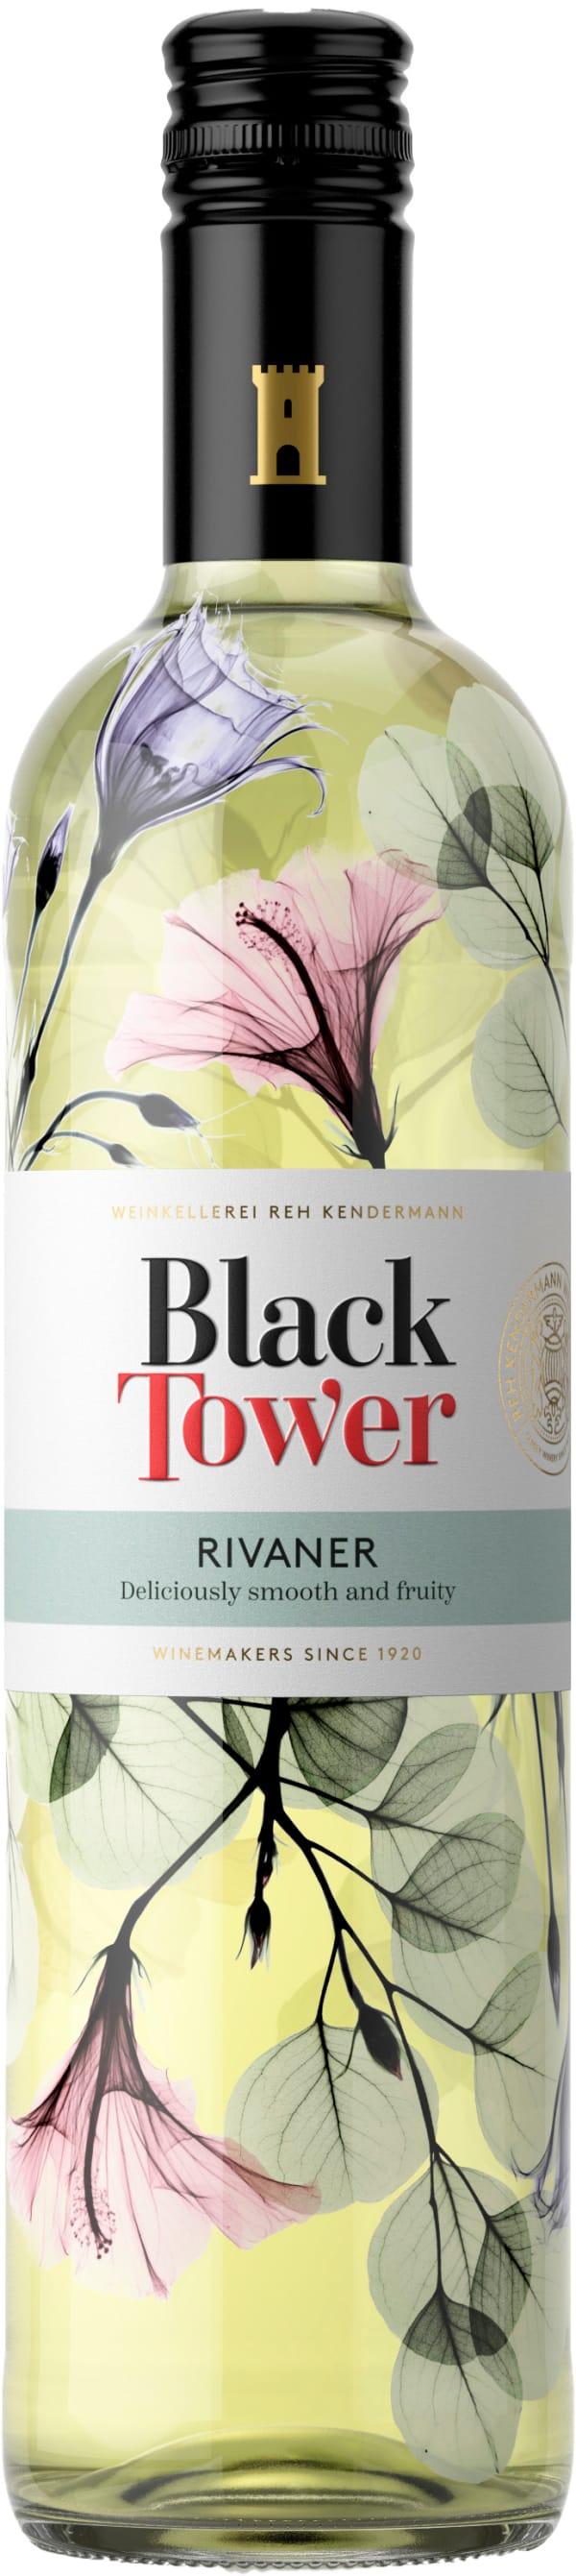 Black Tower Rivaner 2019